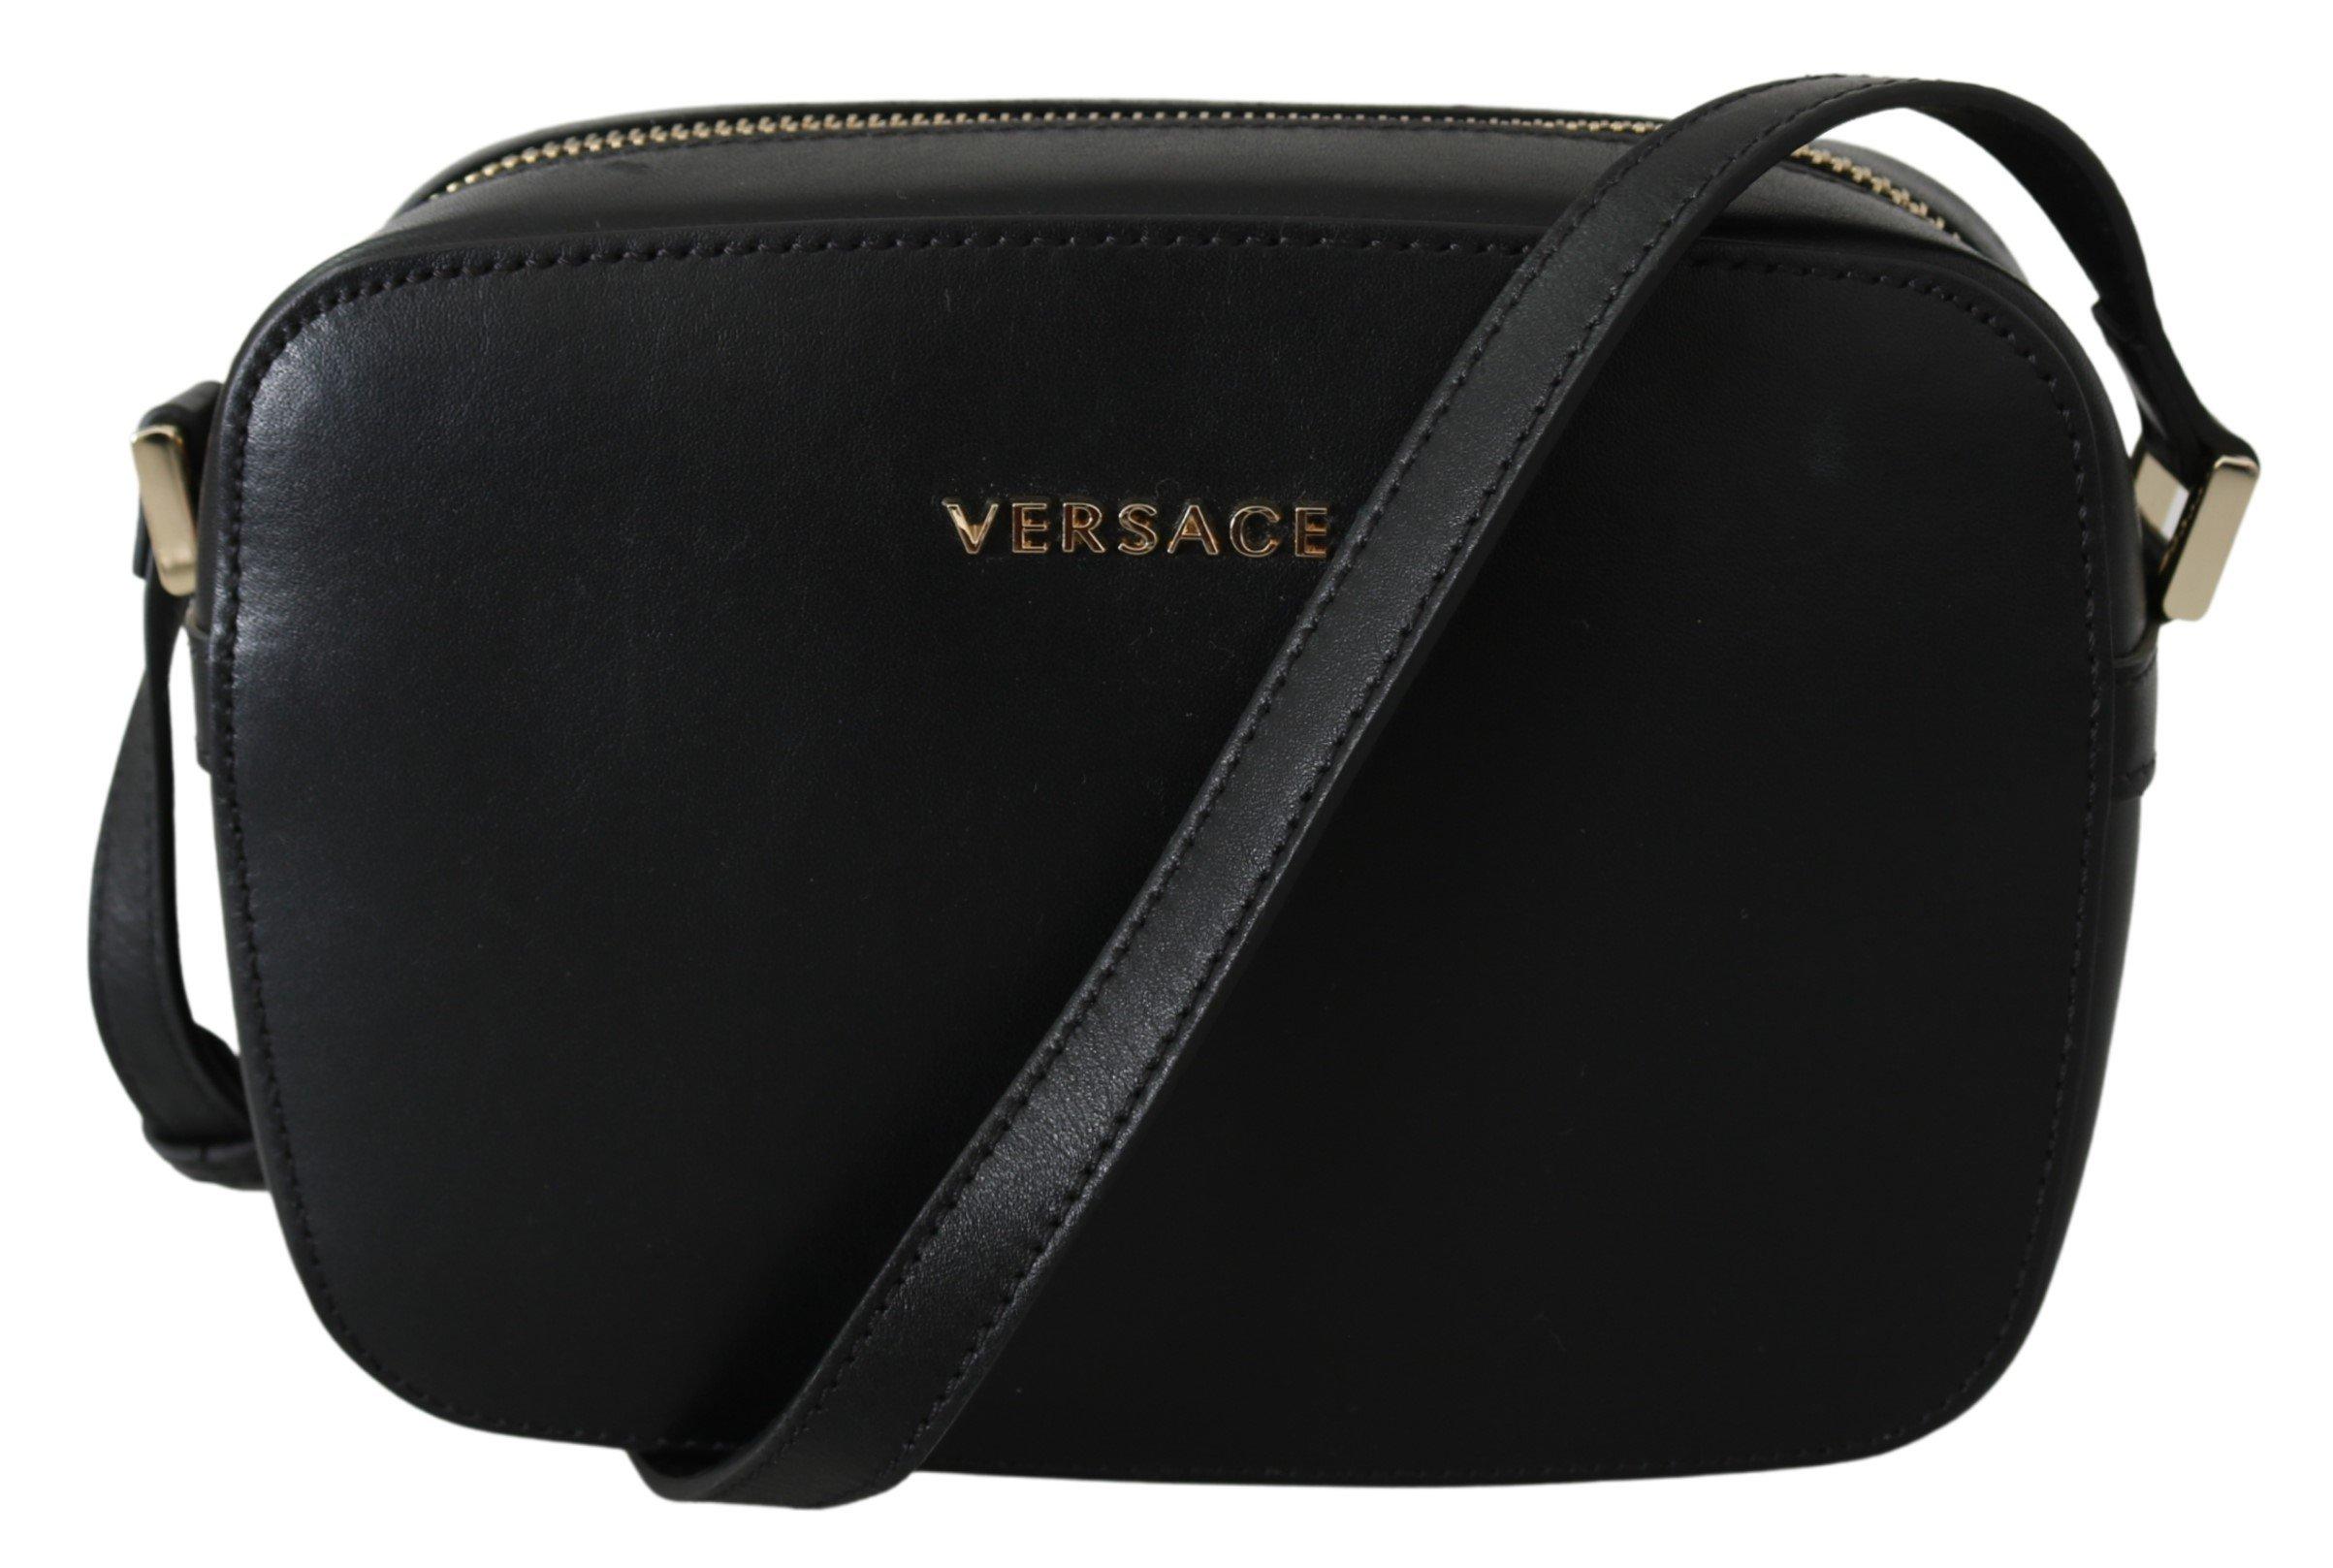 Versace Women's Leather Crossbody Bag Black 8053850421640